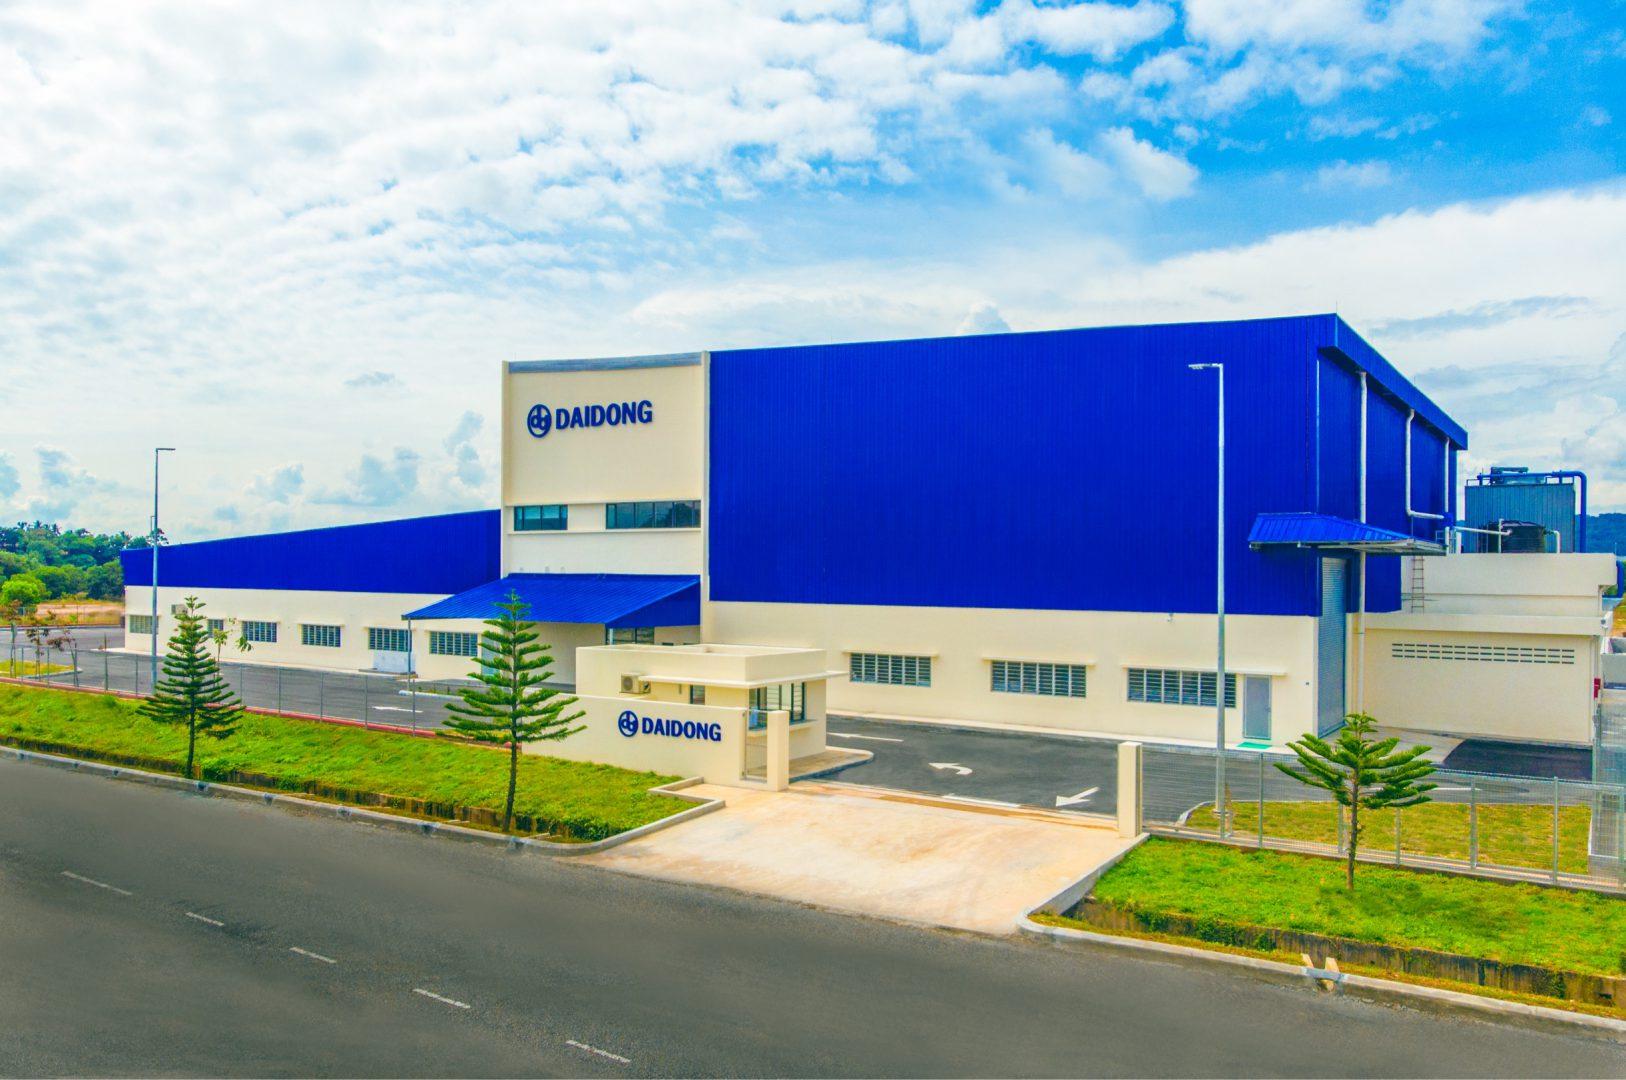 Daidong Engineering Malaysia Sdn Bhd